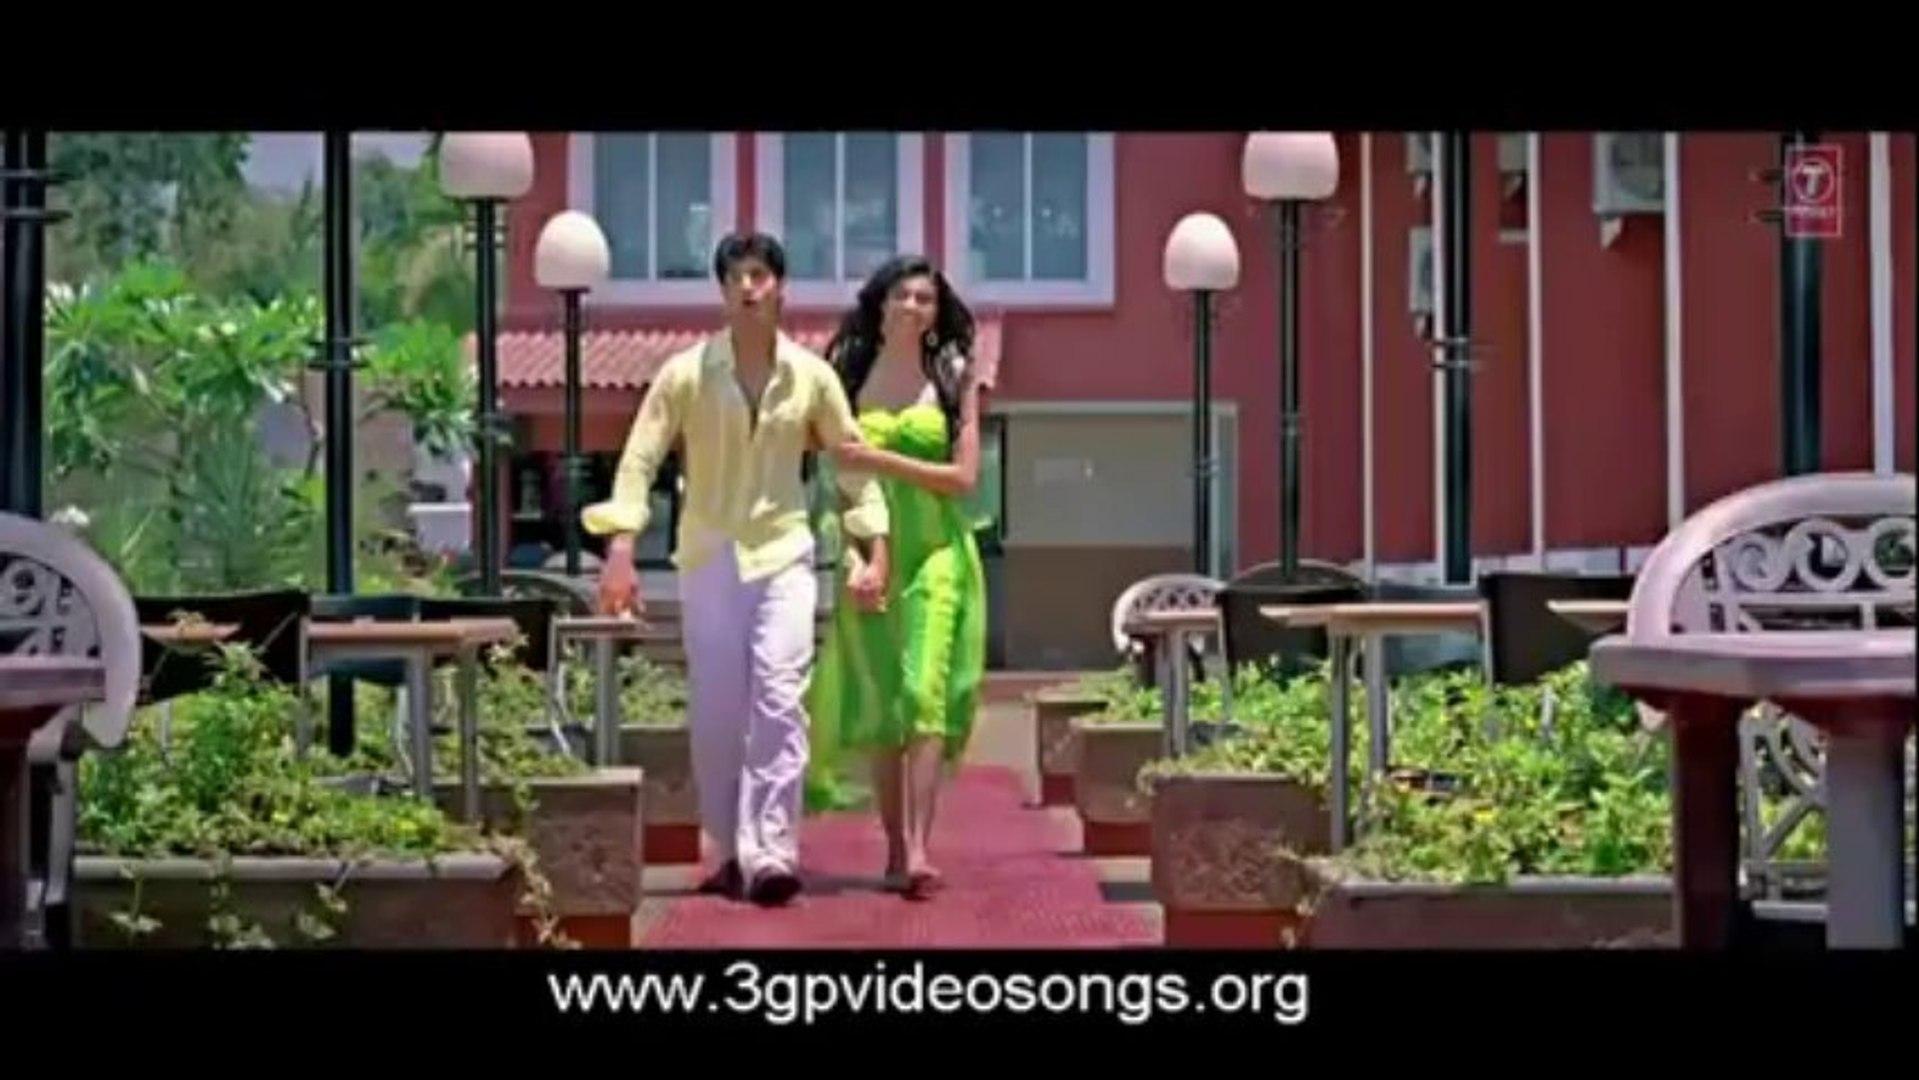 MP4,3gp,MP3,Download tumsa nahi koi Video Song _ Lyrics of tumsa nahi koi